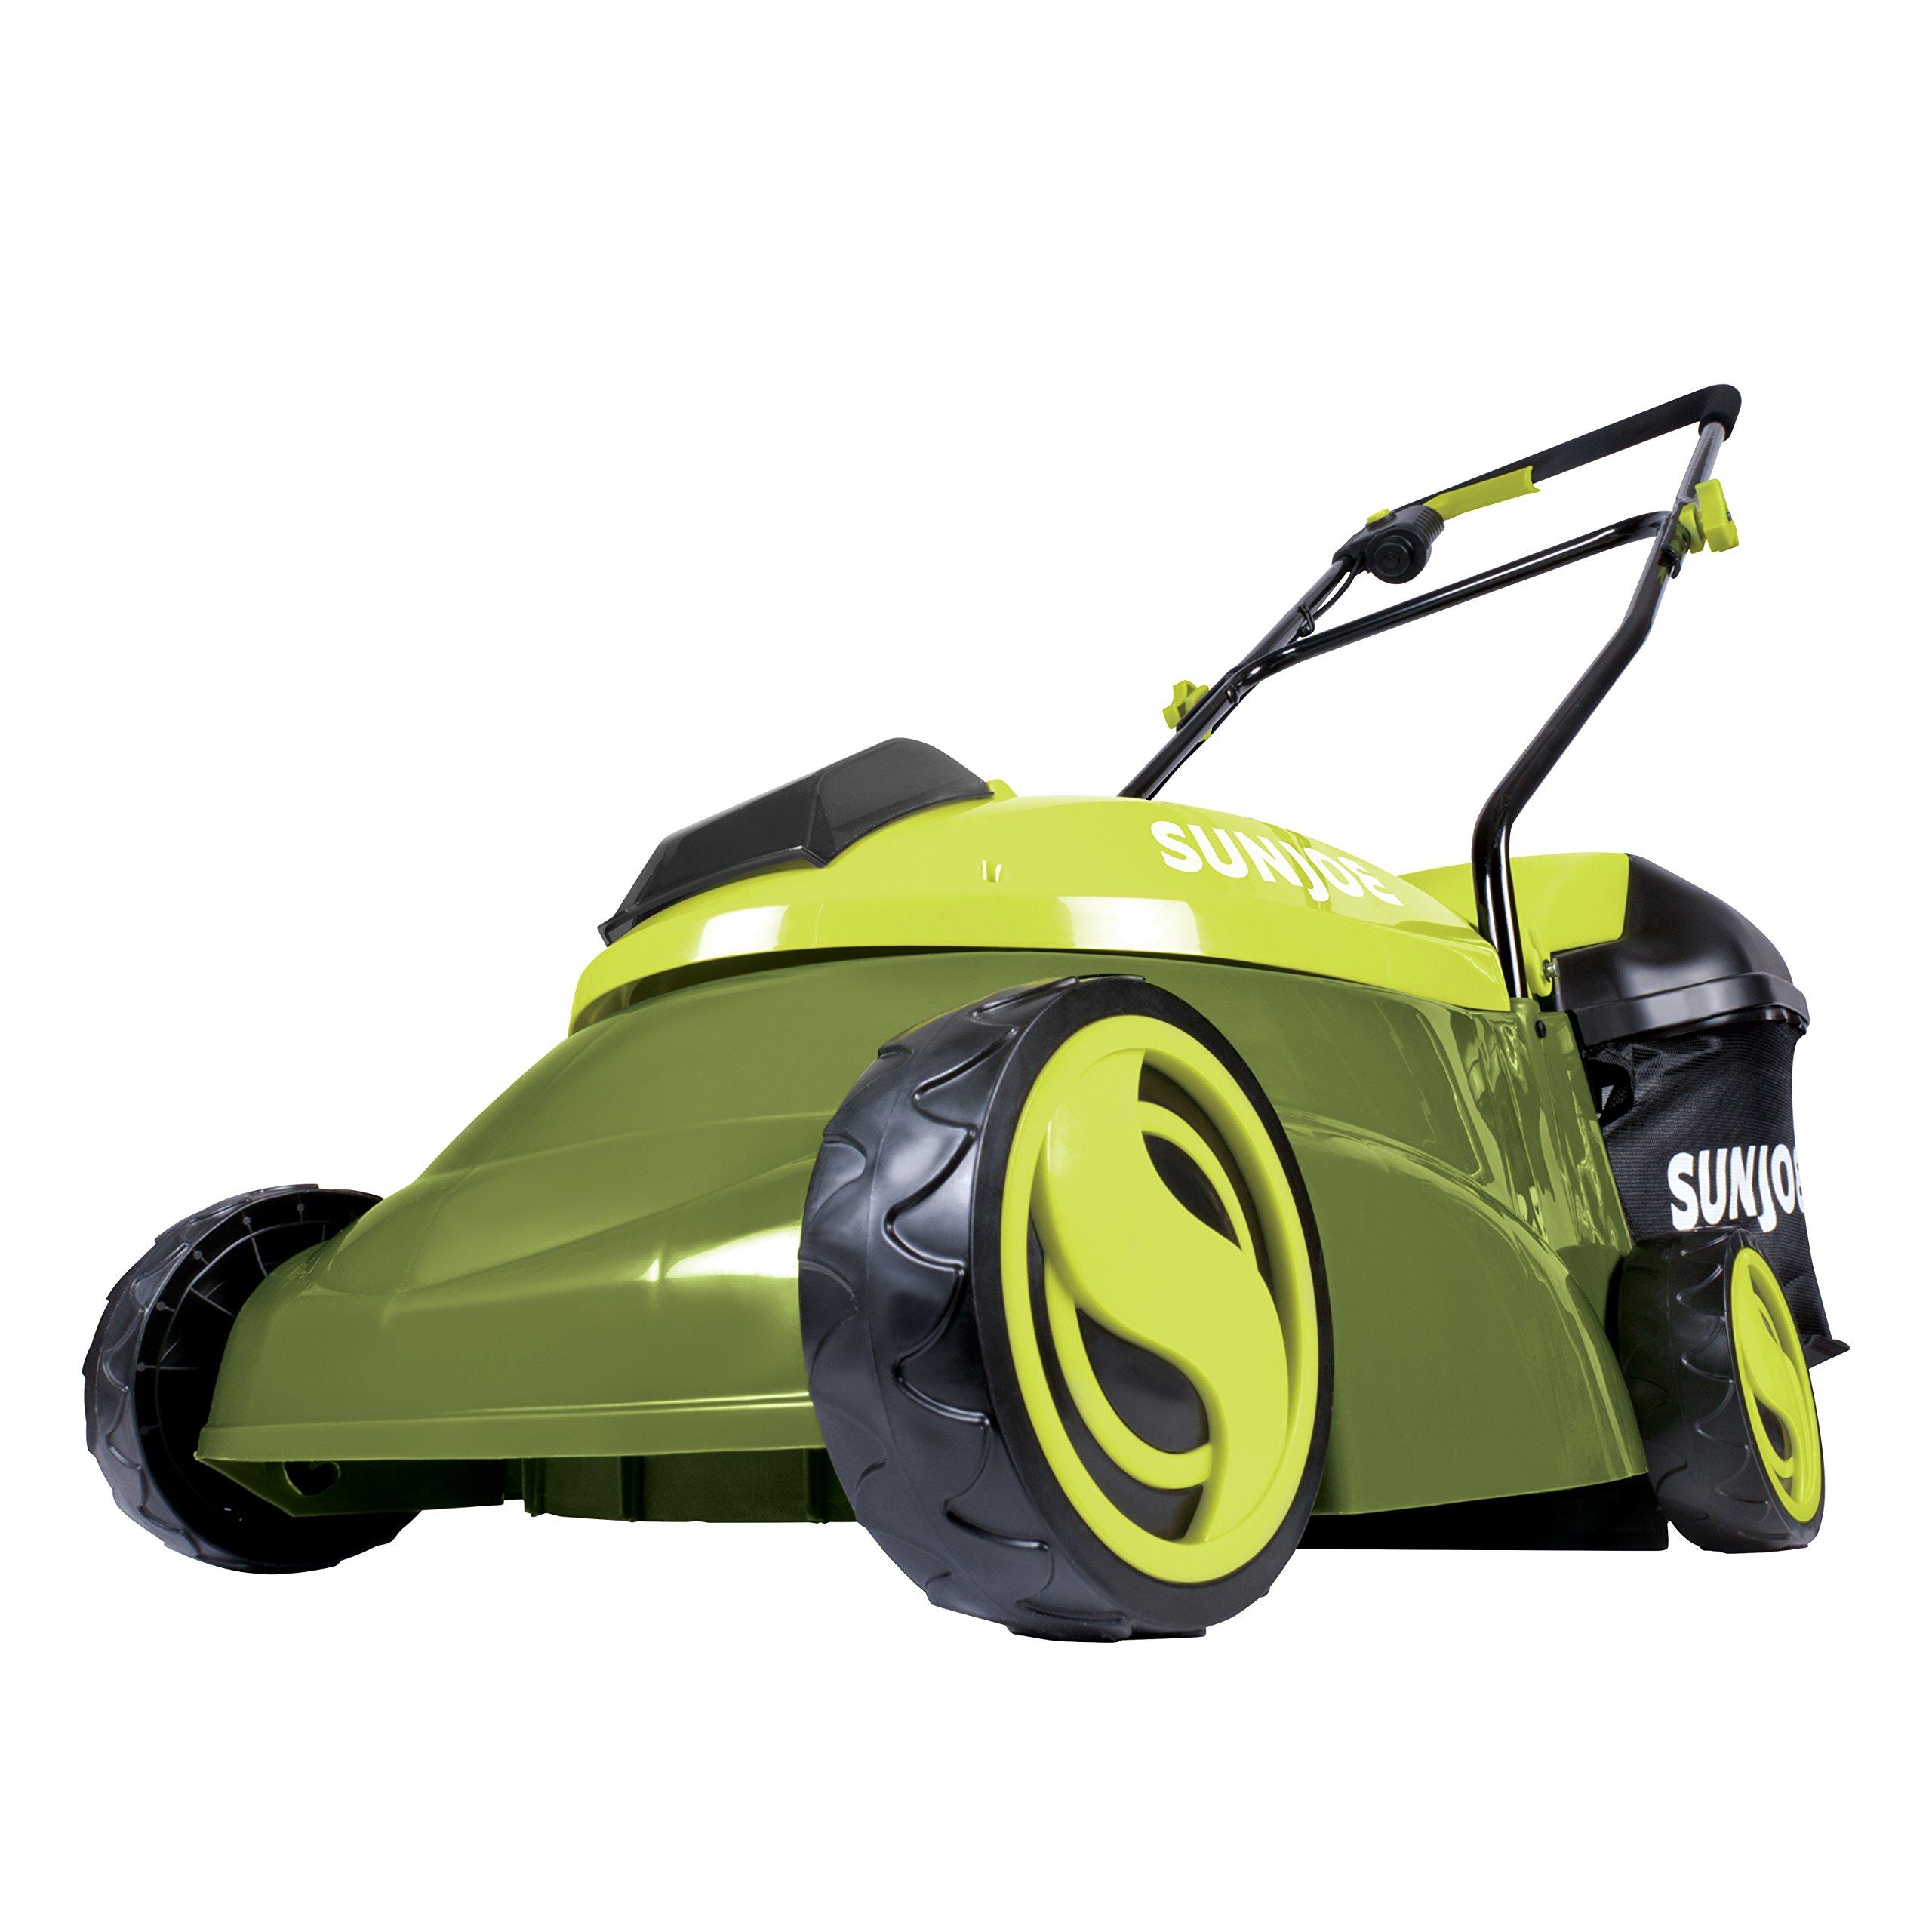 Sun Joe MJ401C 14-Inch 28-Volt Cordless Push Lawn Mower by Snow Joe